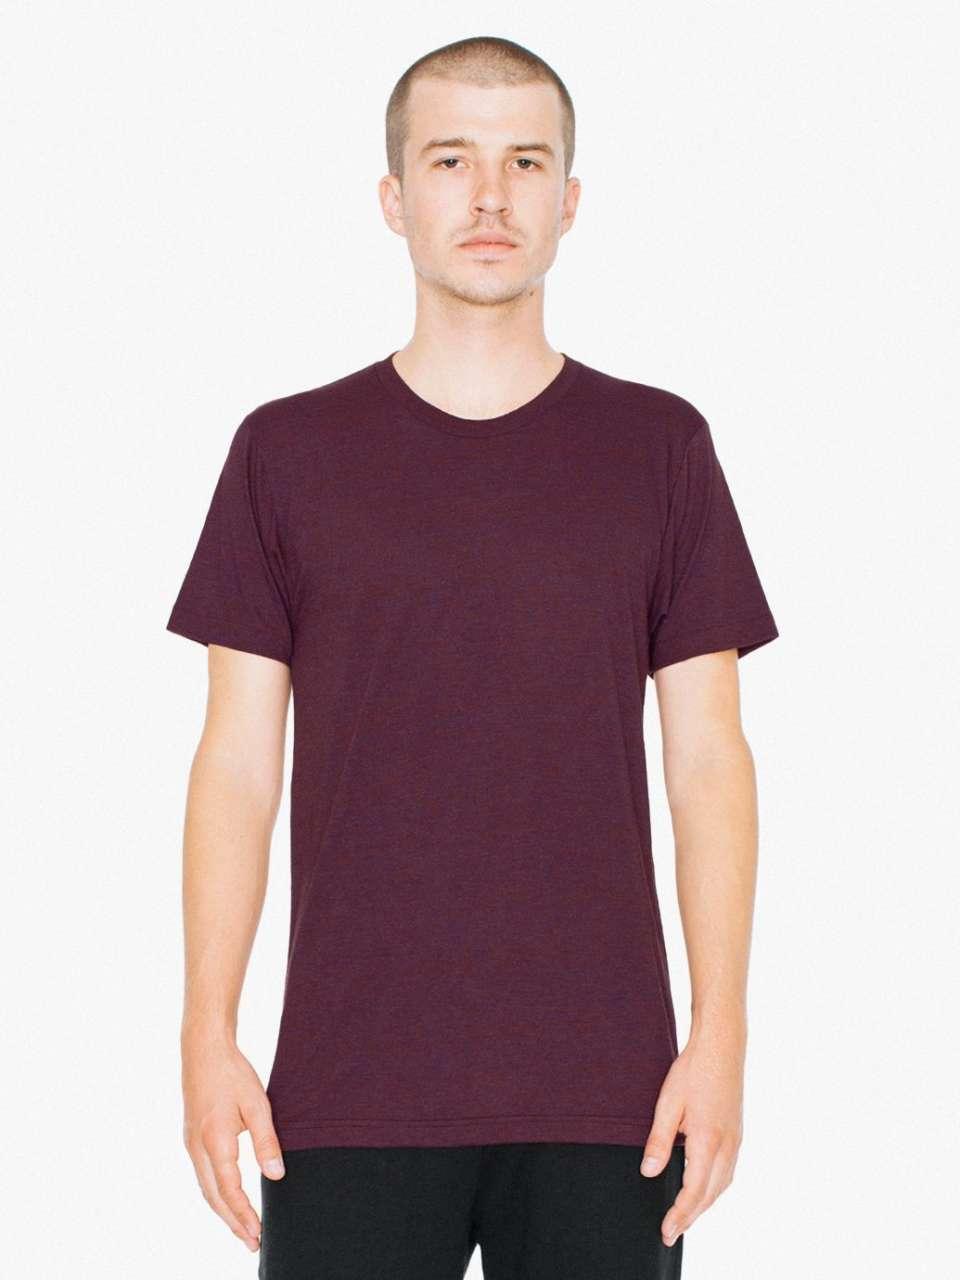 Levně Unisex tričko TRI-BLEND American Apparel – tri-brusinková, vel. S